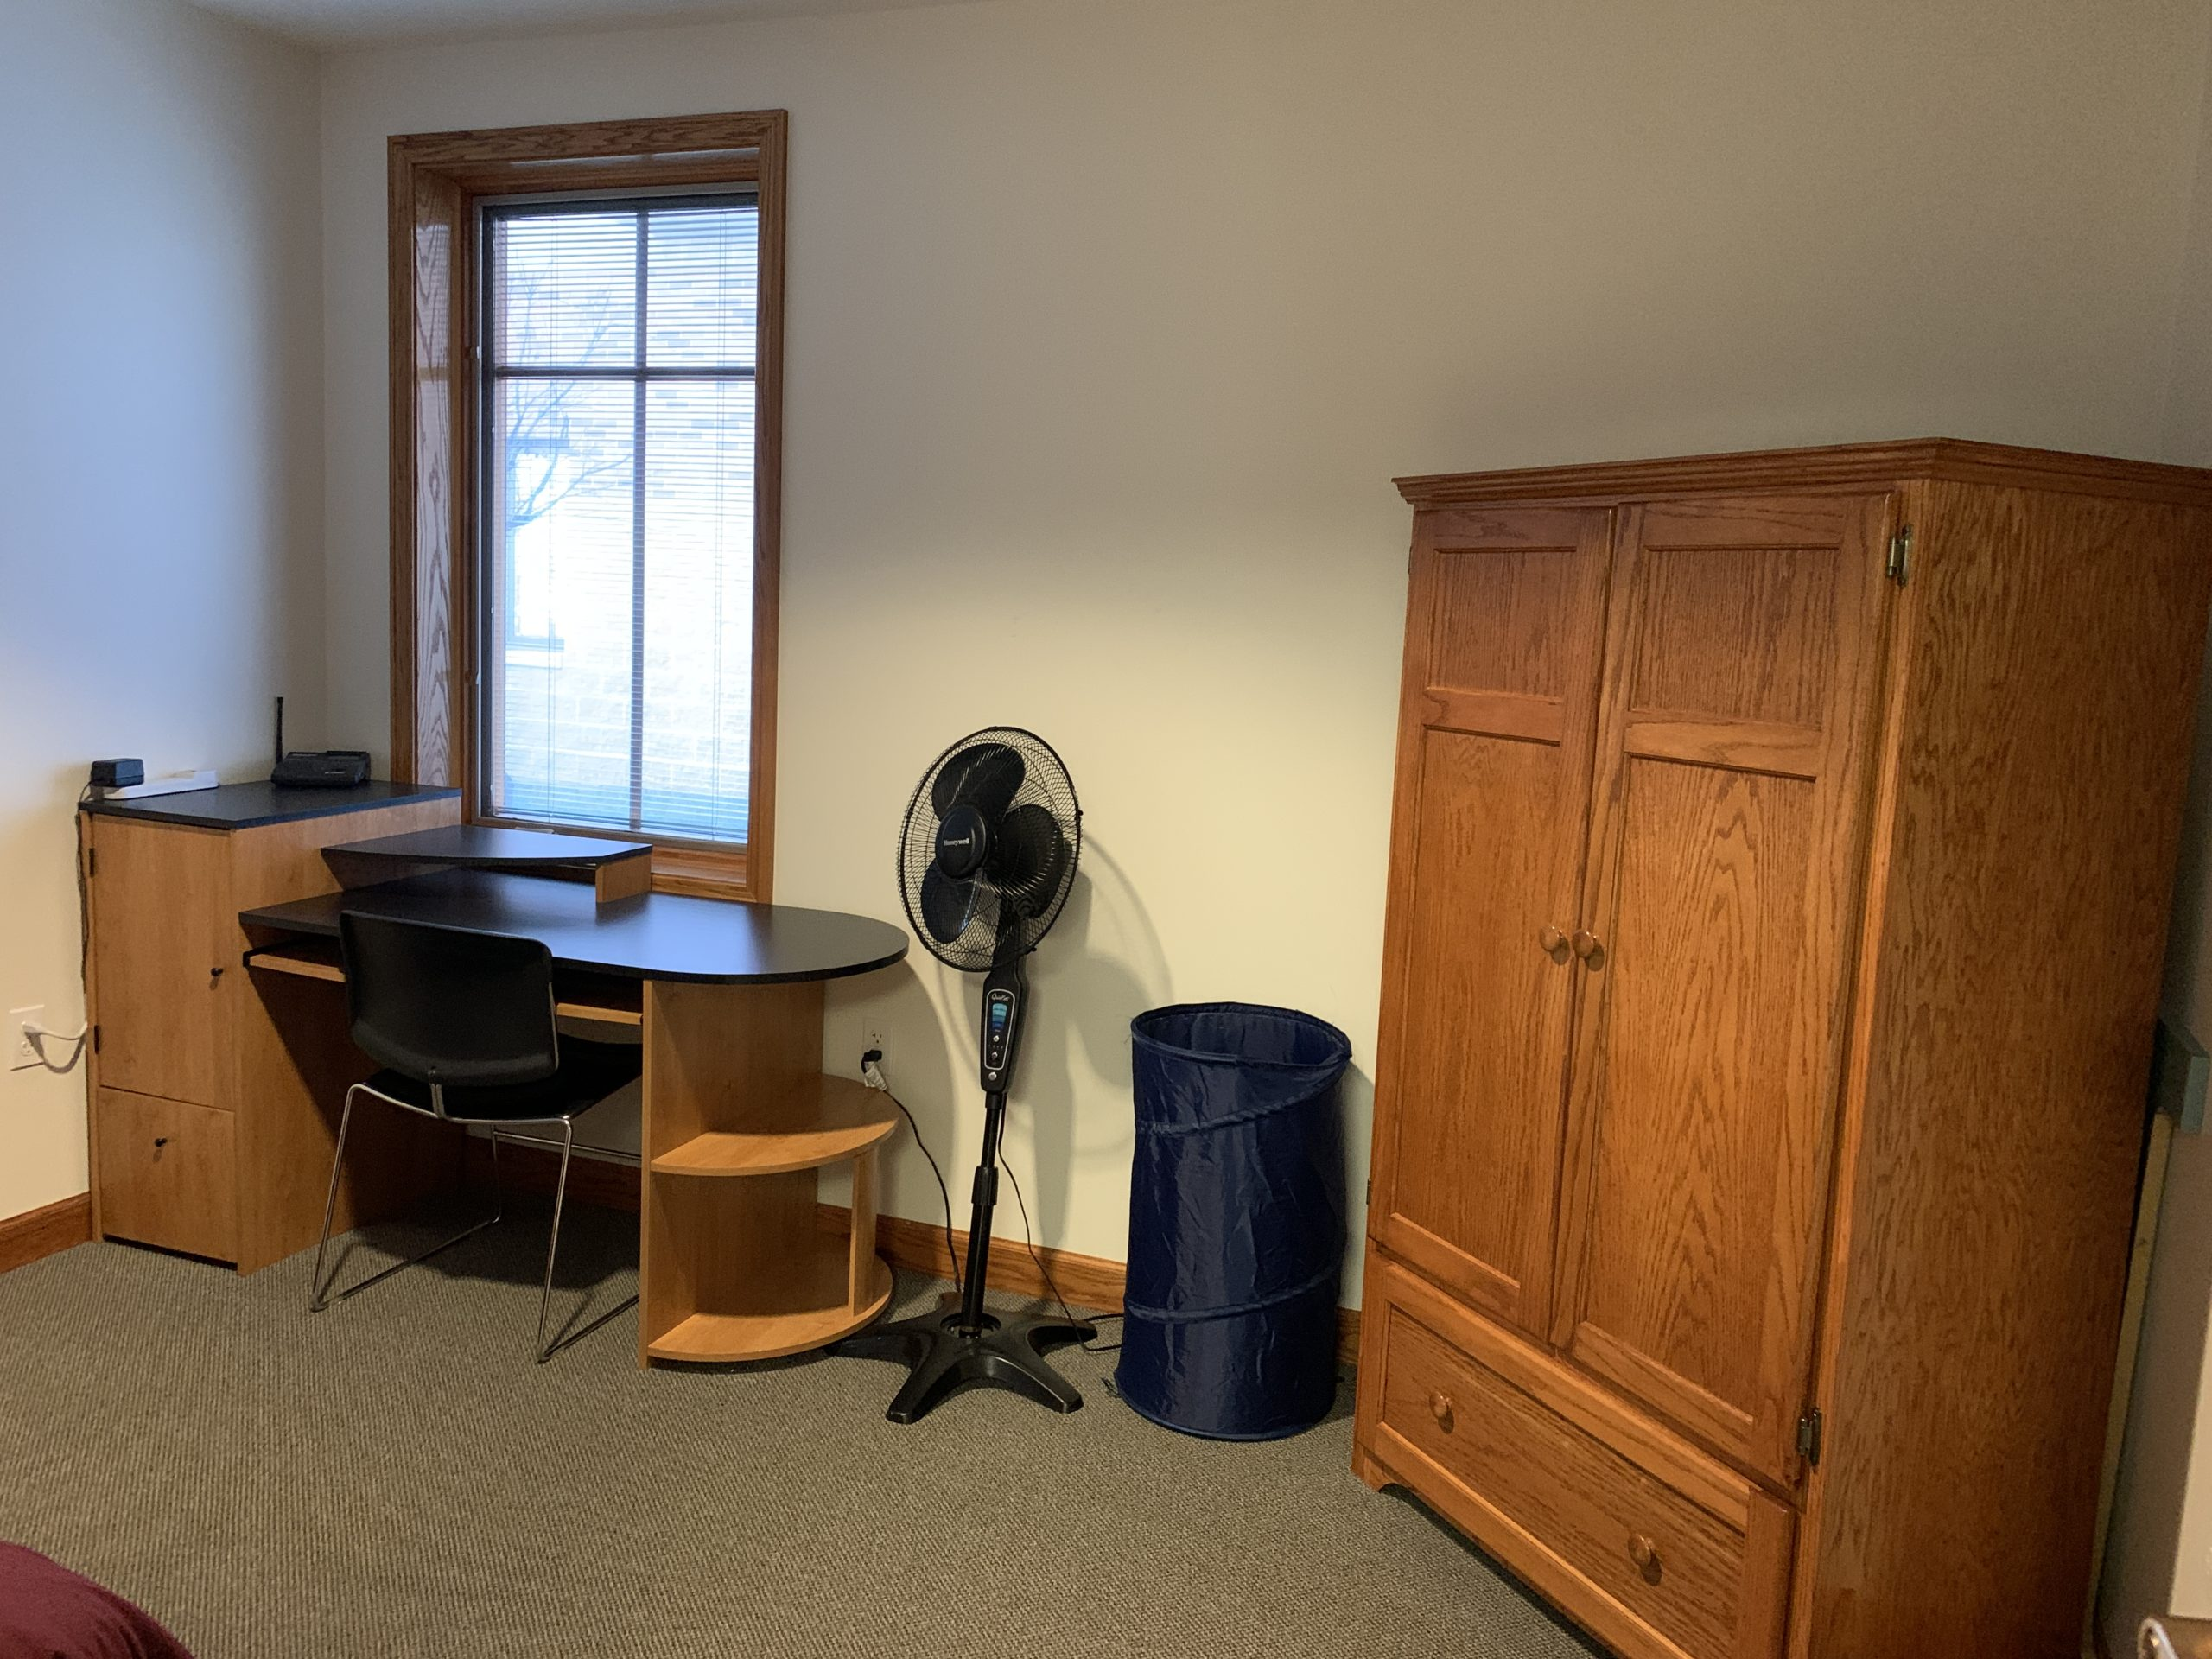 Cottage Bedroom Desk, Standing Fan, And Wardrobe